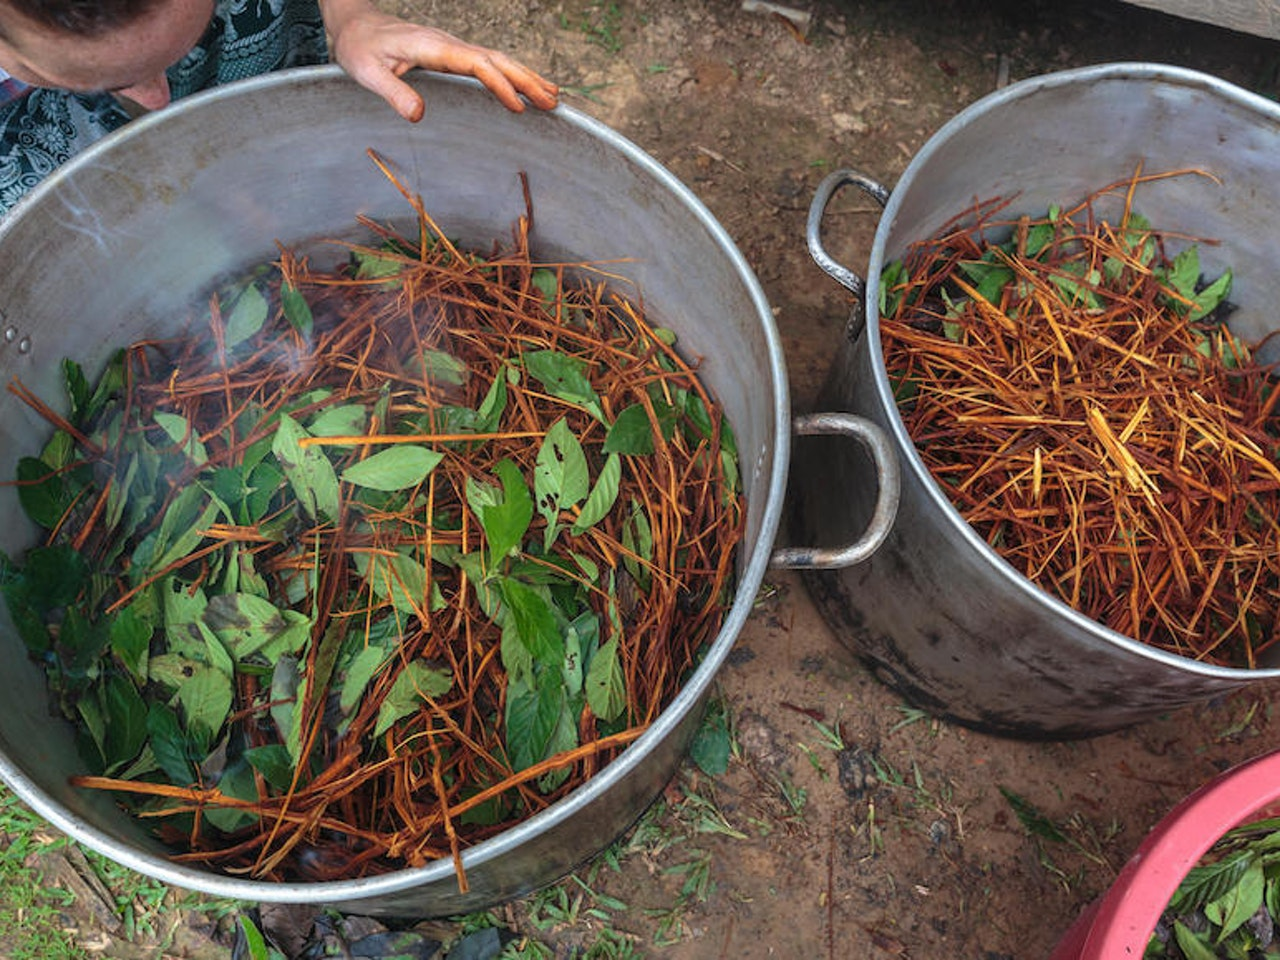 ayahuasca-brew-legal.jpg